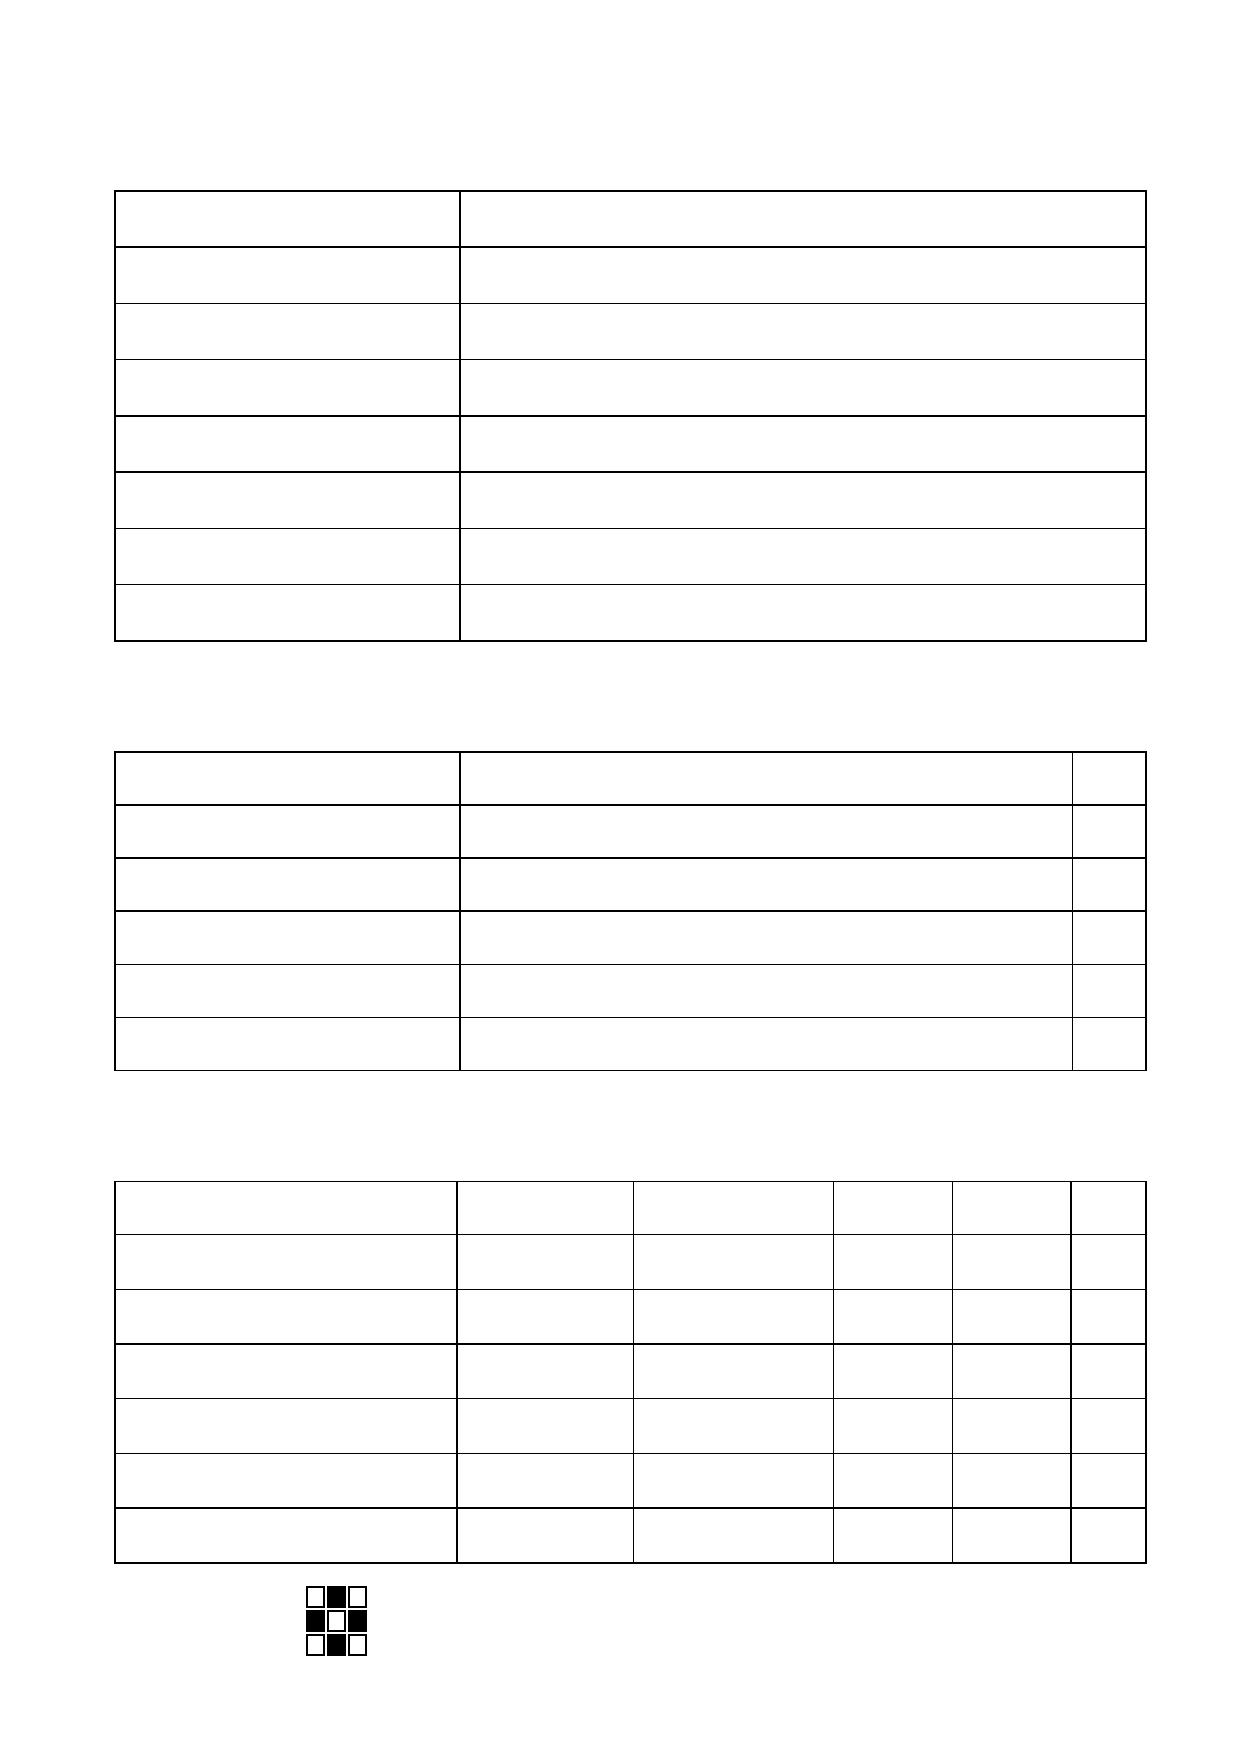 PG320240FRM-CNNiYL pdf, 반도체, 판매, 대치품